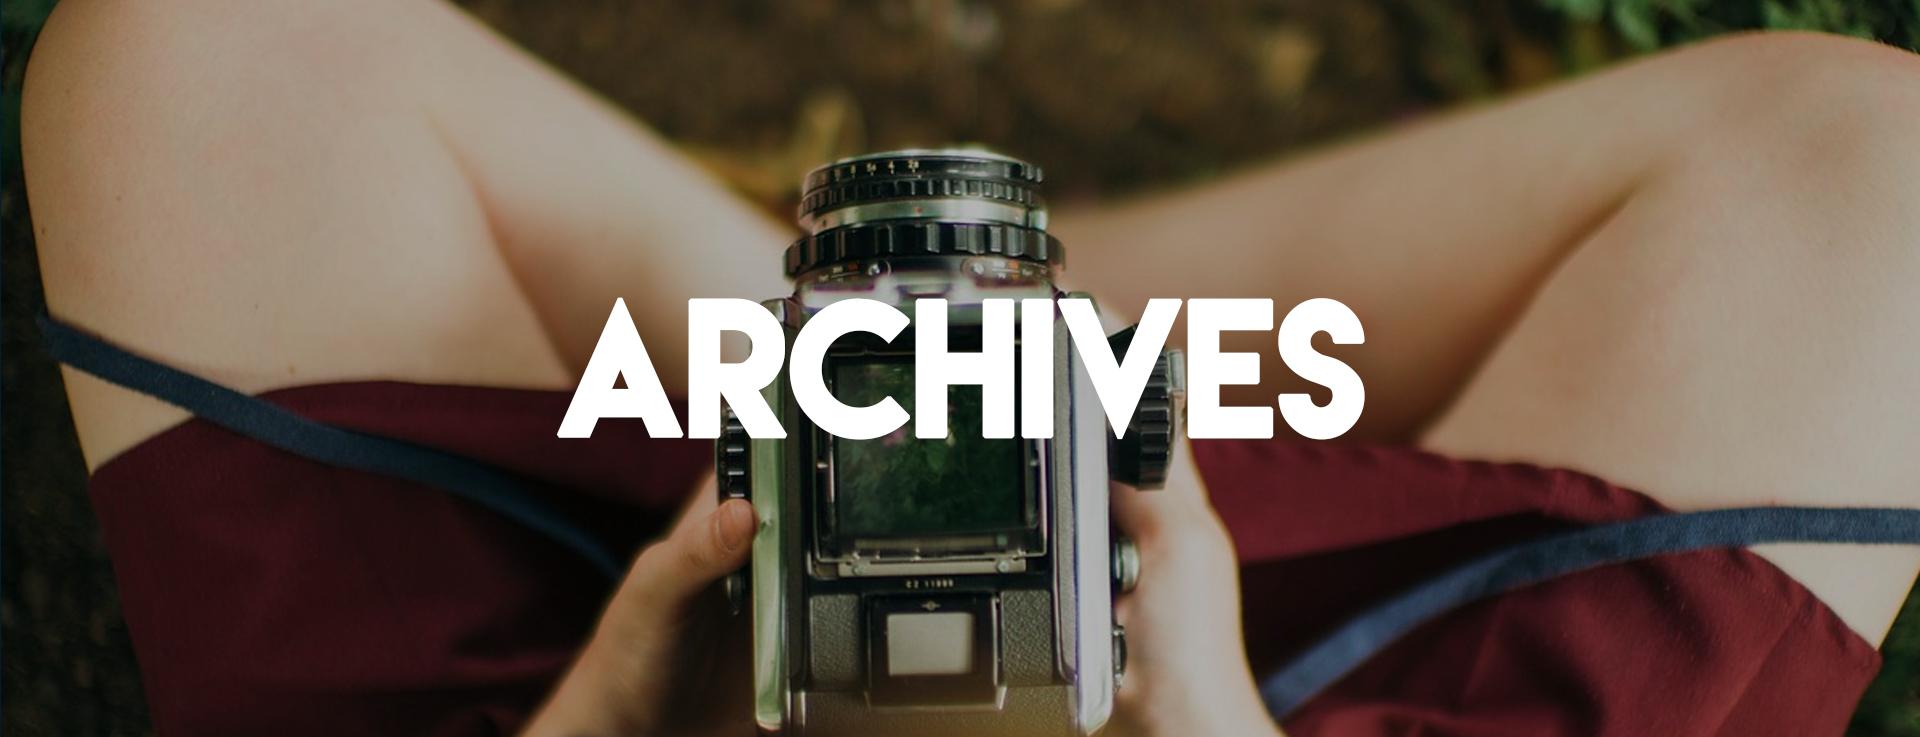 Sylvain Berard - Archives